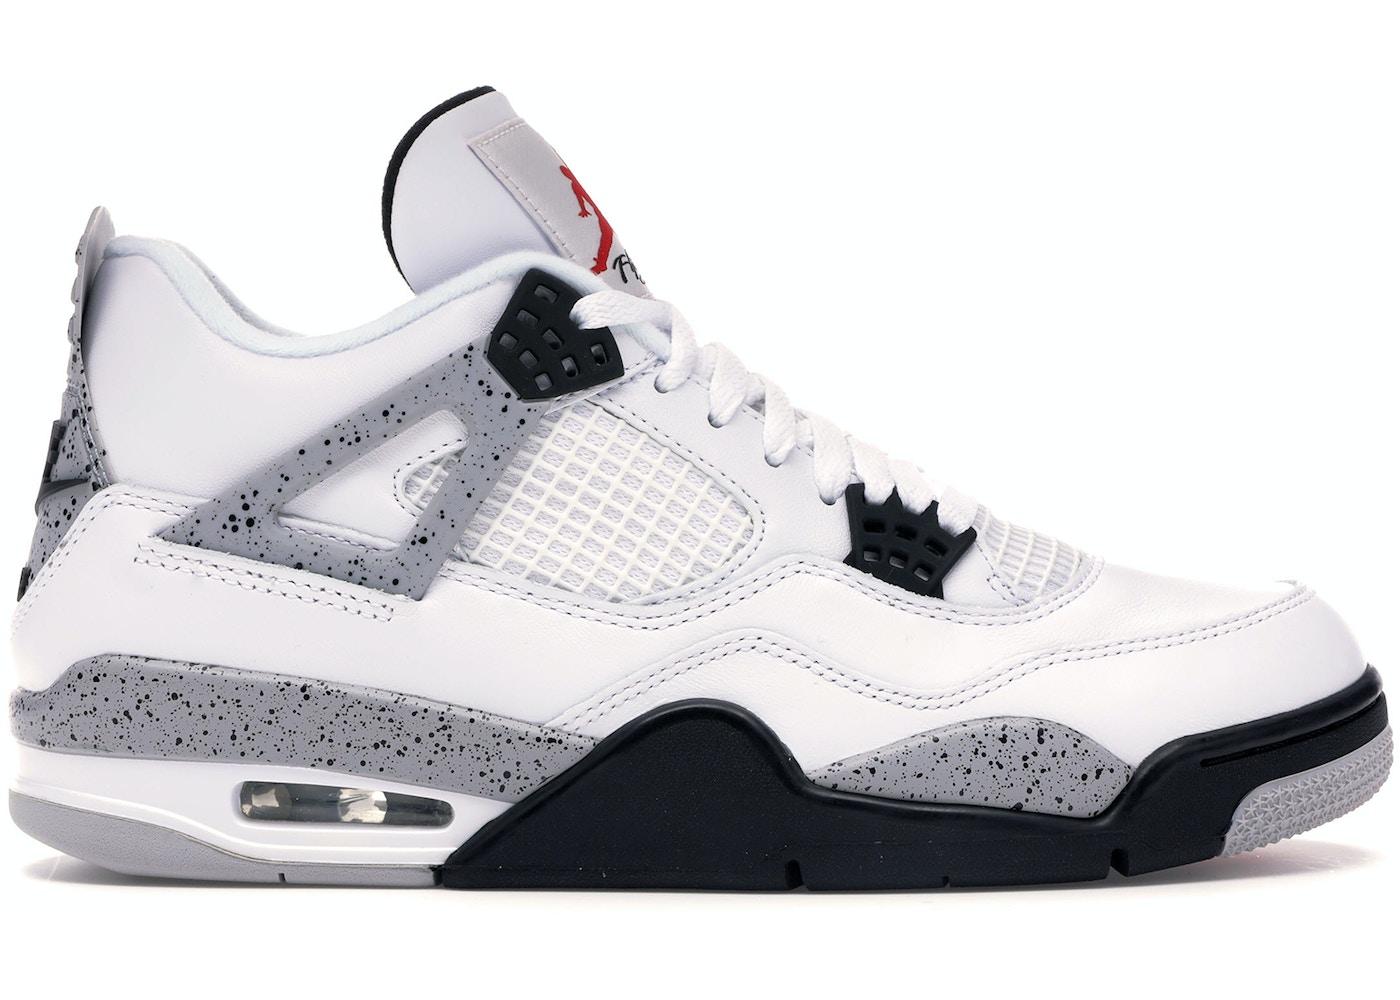 online store 1e983 984f2 Buy Air Jordan 4 Shoes   Deadstock Sneakers